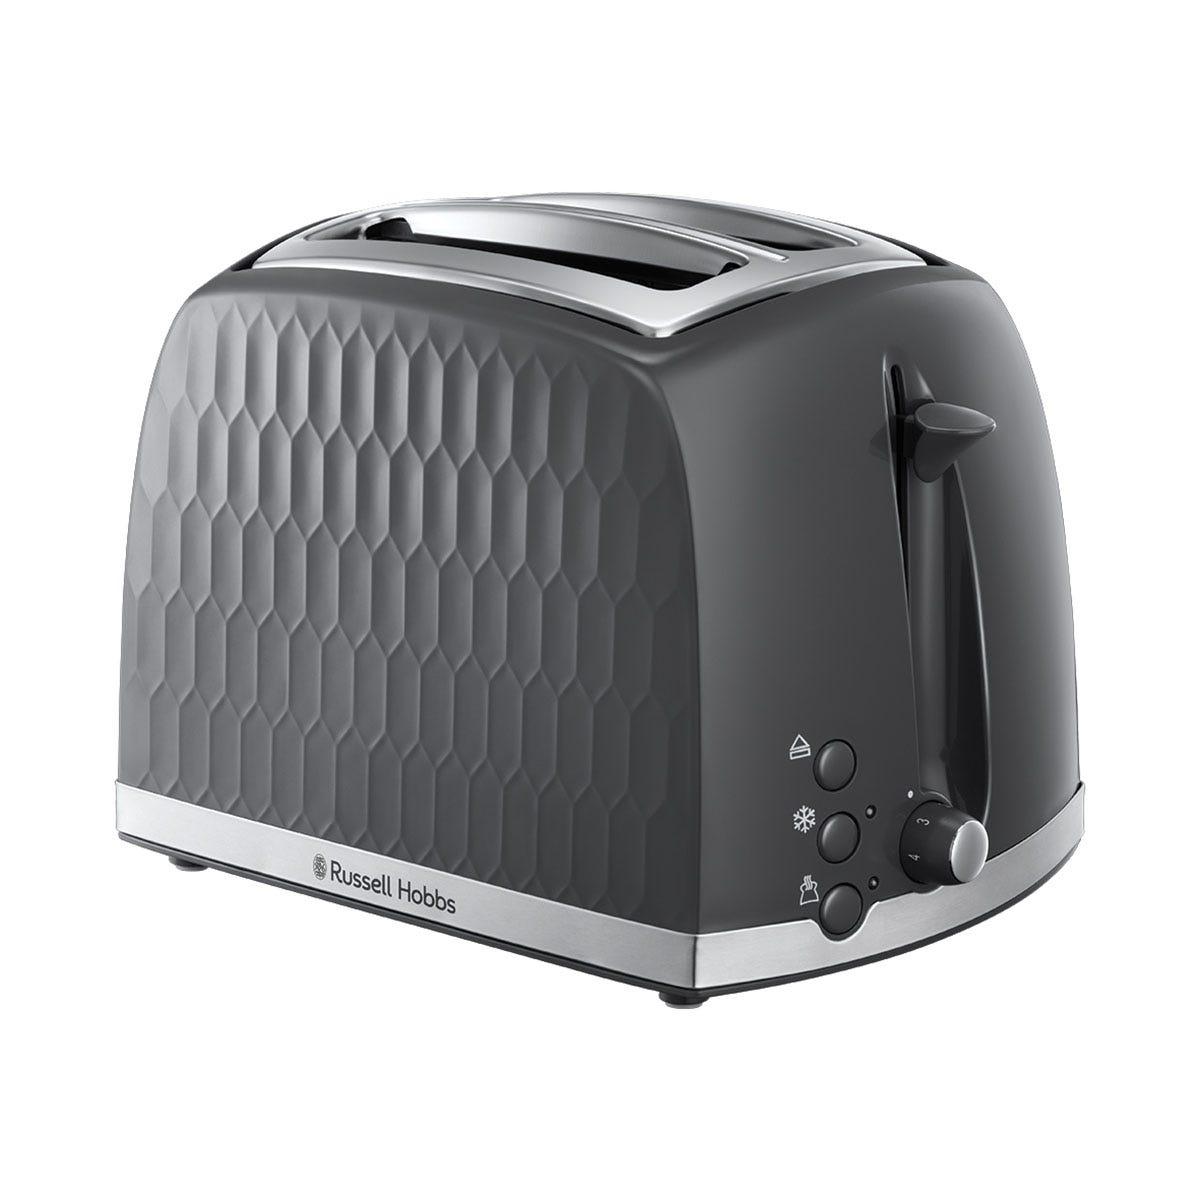 Russell Hobbs 26063 Honeycomb Textured 850W 2-Slice Toaster - Grey